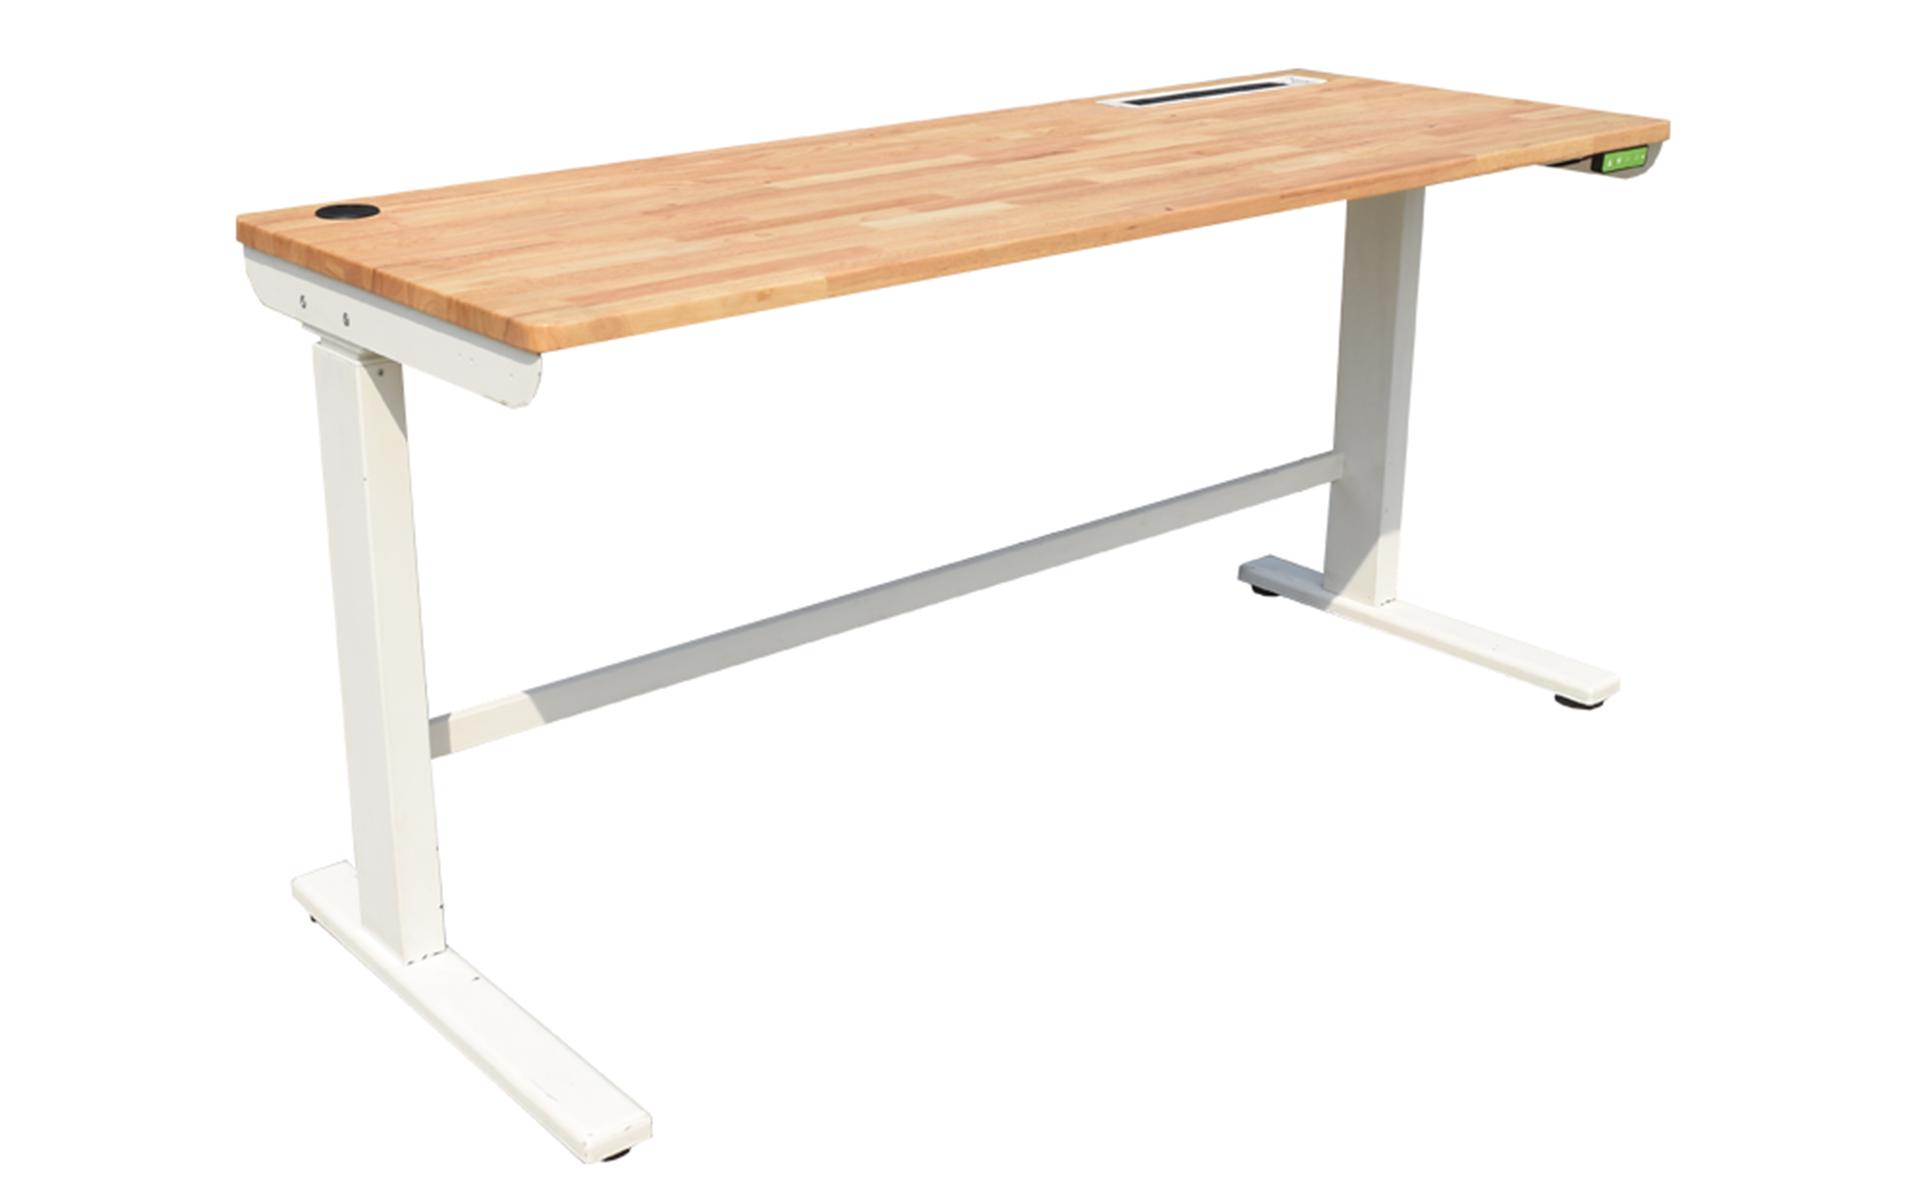 Auto adjustable table / CSPS CO., LTD.